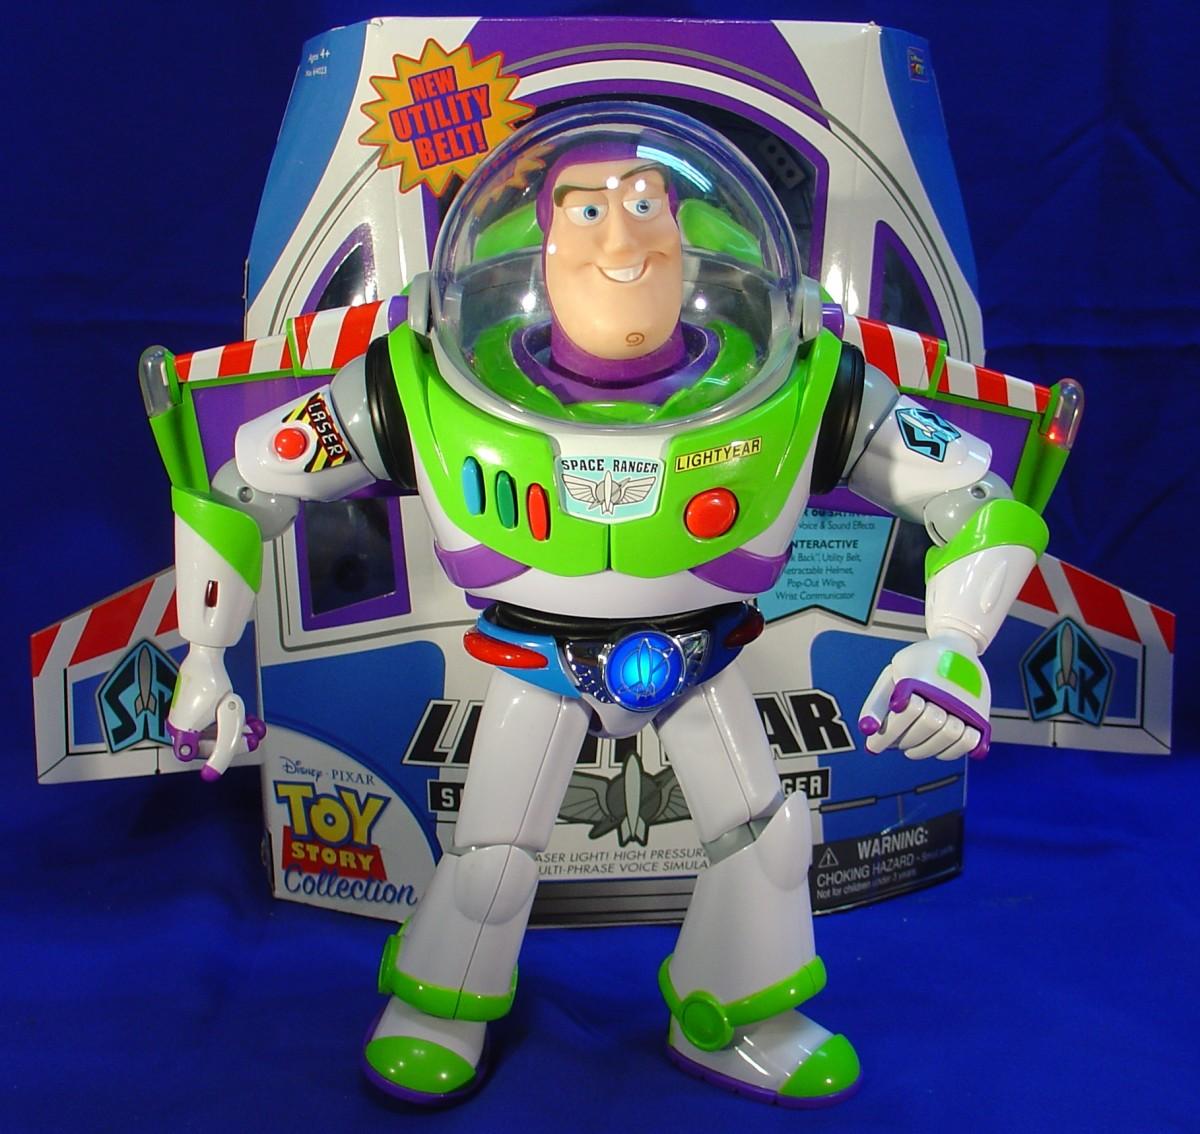 Note Buzz's Utility Belt lights up.